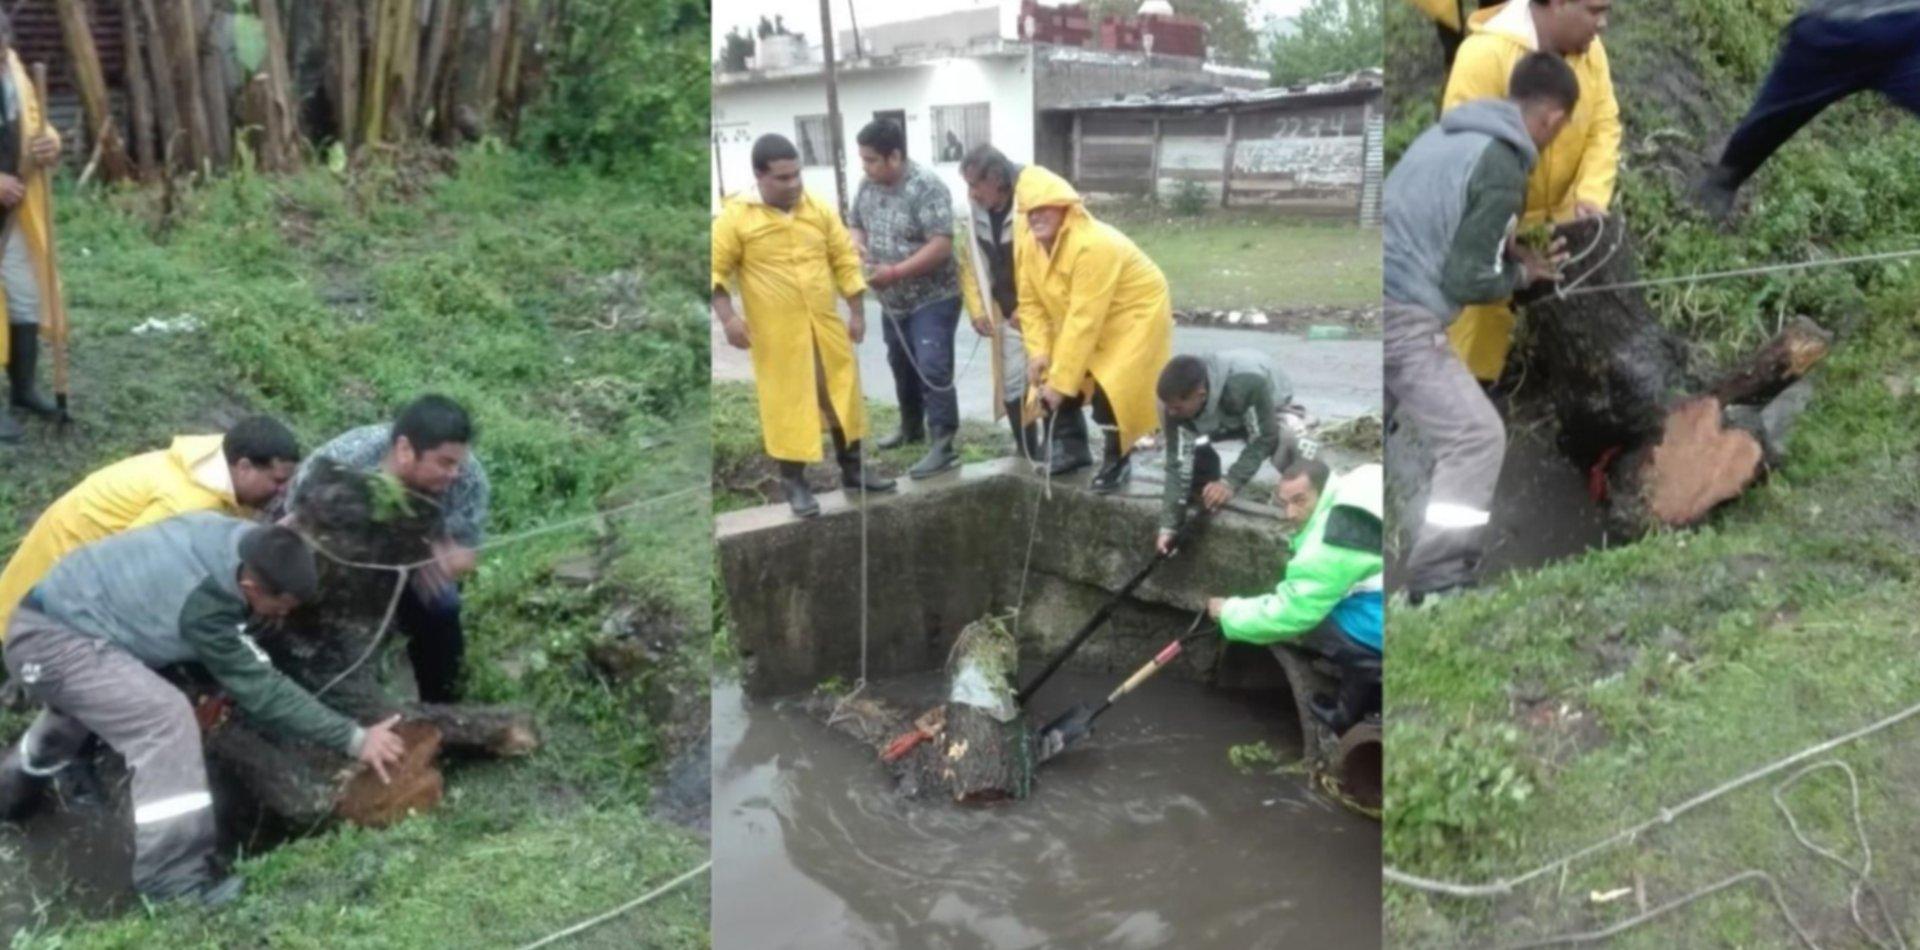 VIDEO: Boicotearon con dos troncos gigantes los desagües en Altos de San Lorenzo